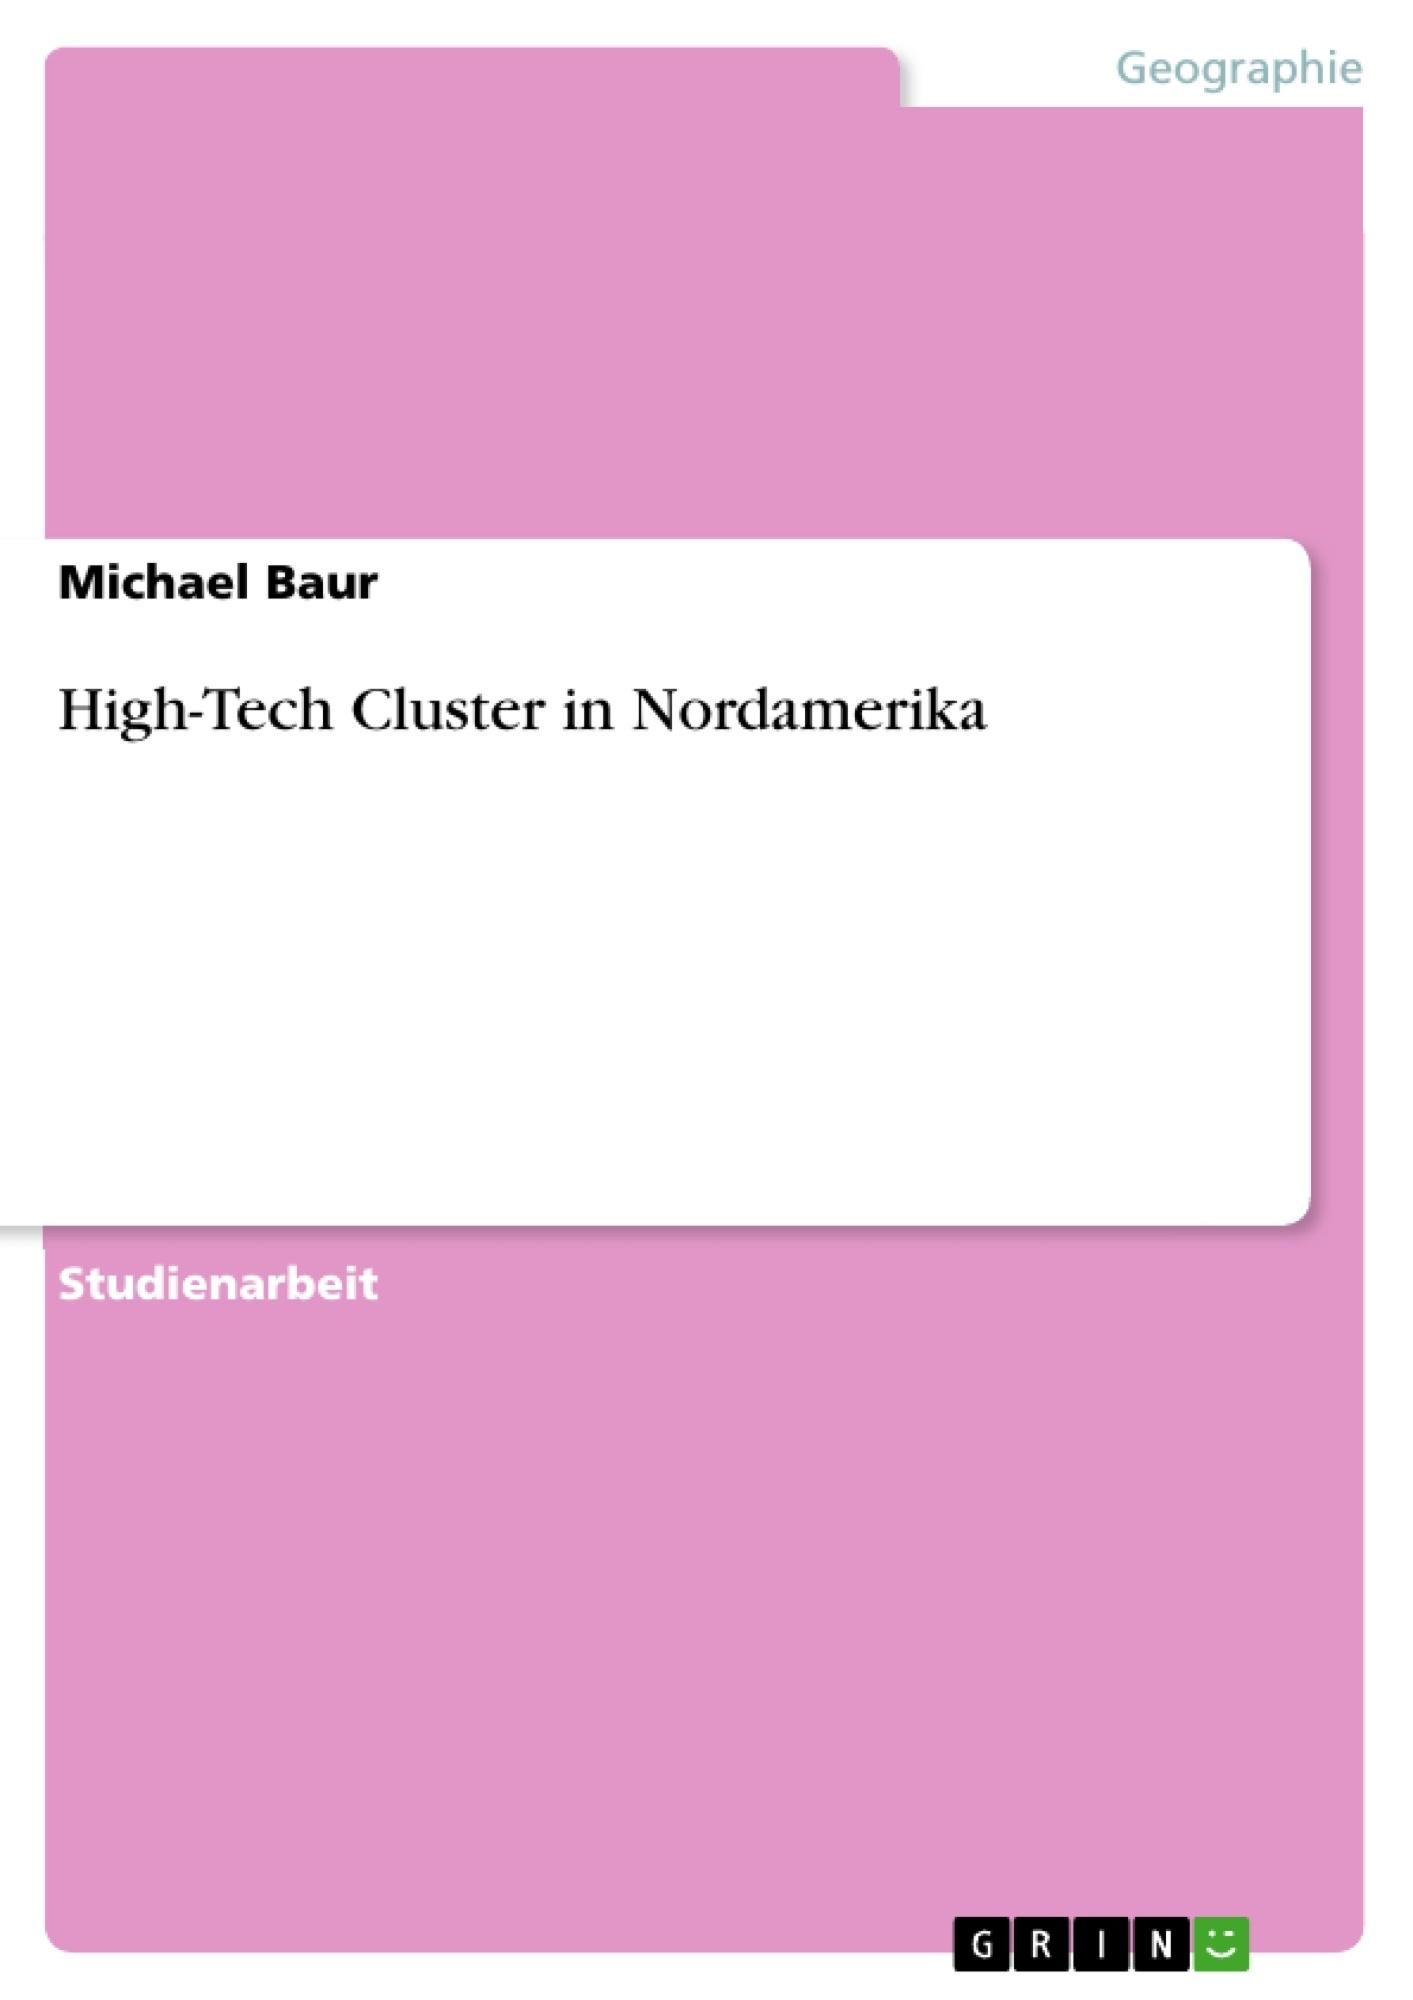 Titel: High-Tech Cluster in Nordamerika